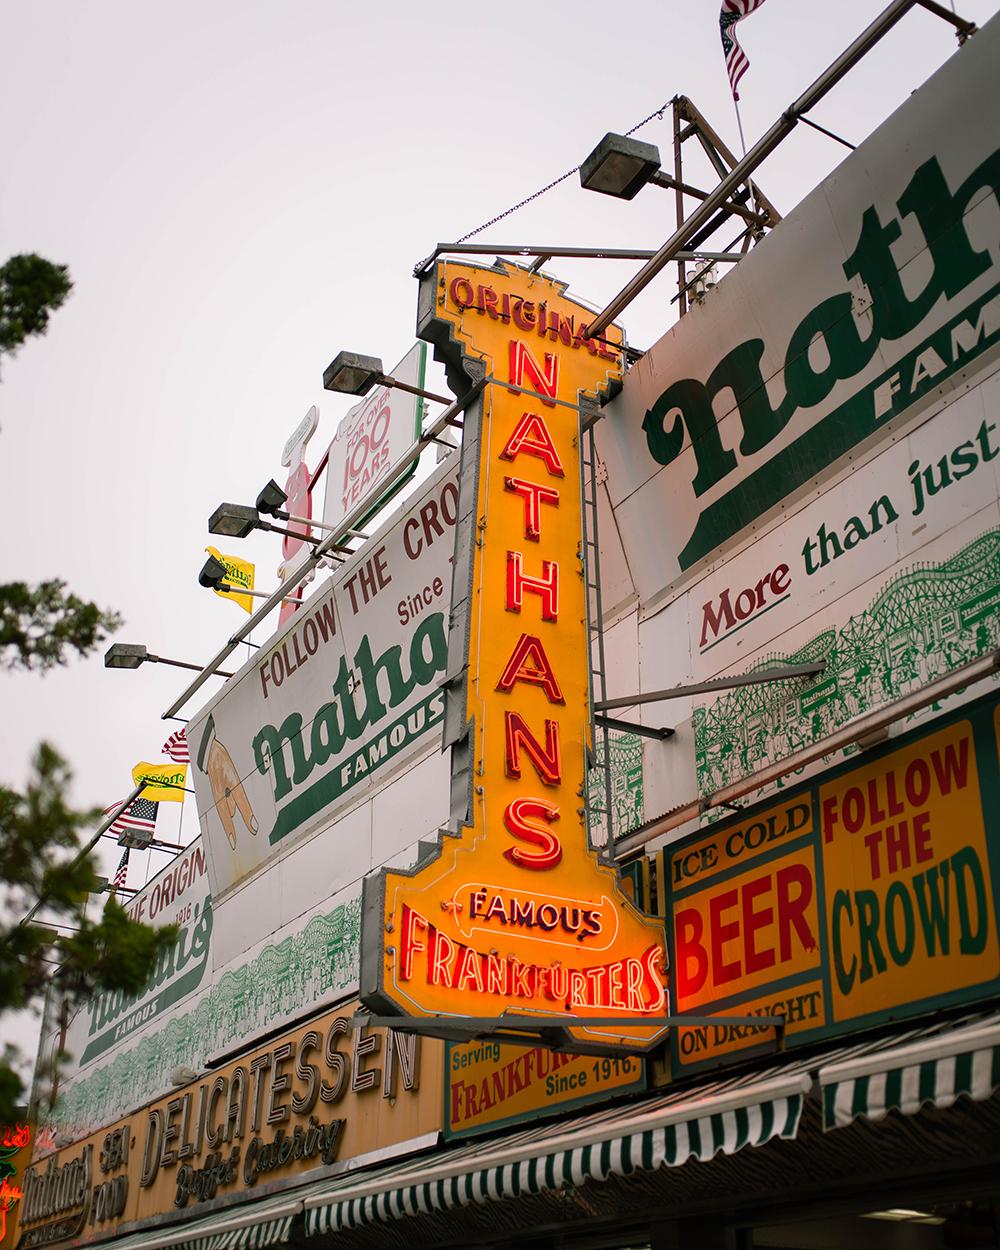 Postcards from Hawaii, NYC, New York City, Itinerary, Coney Island, Nathan's Hot Dog